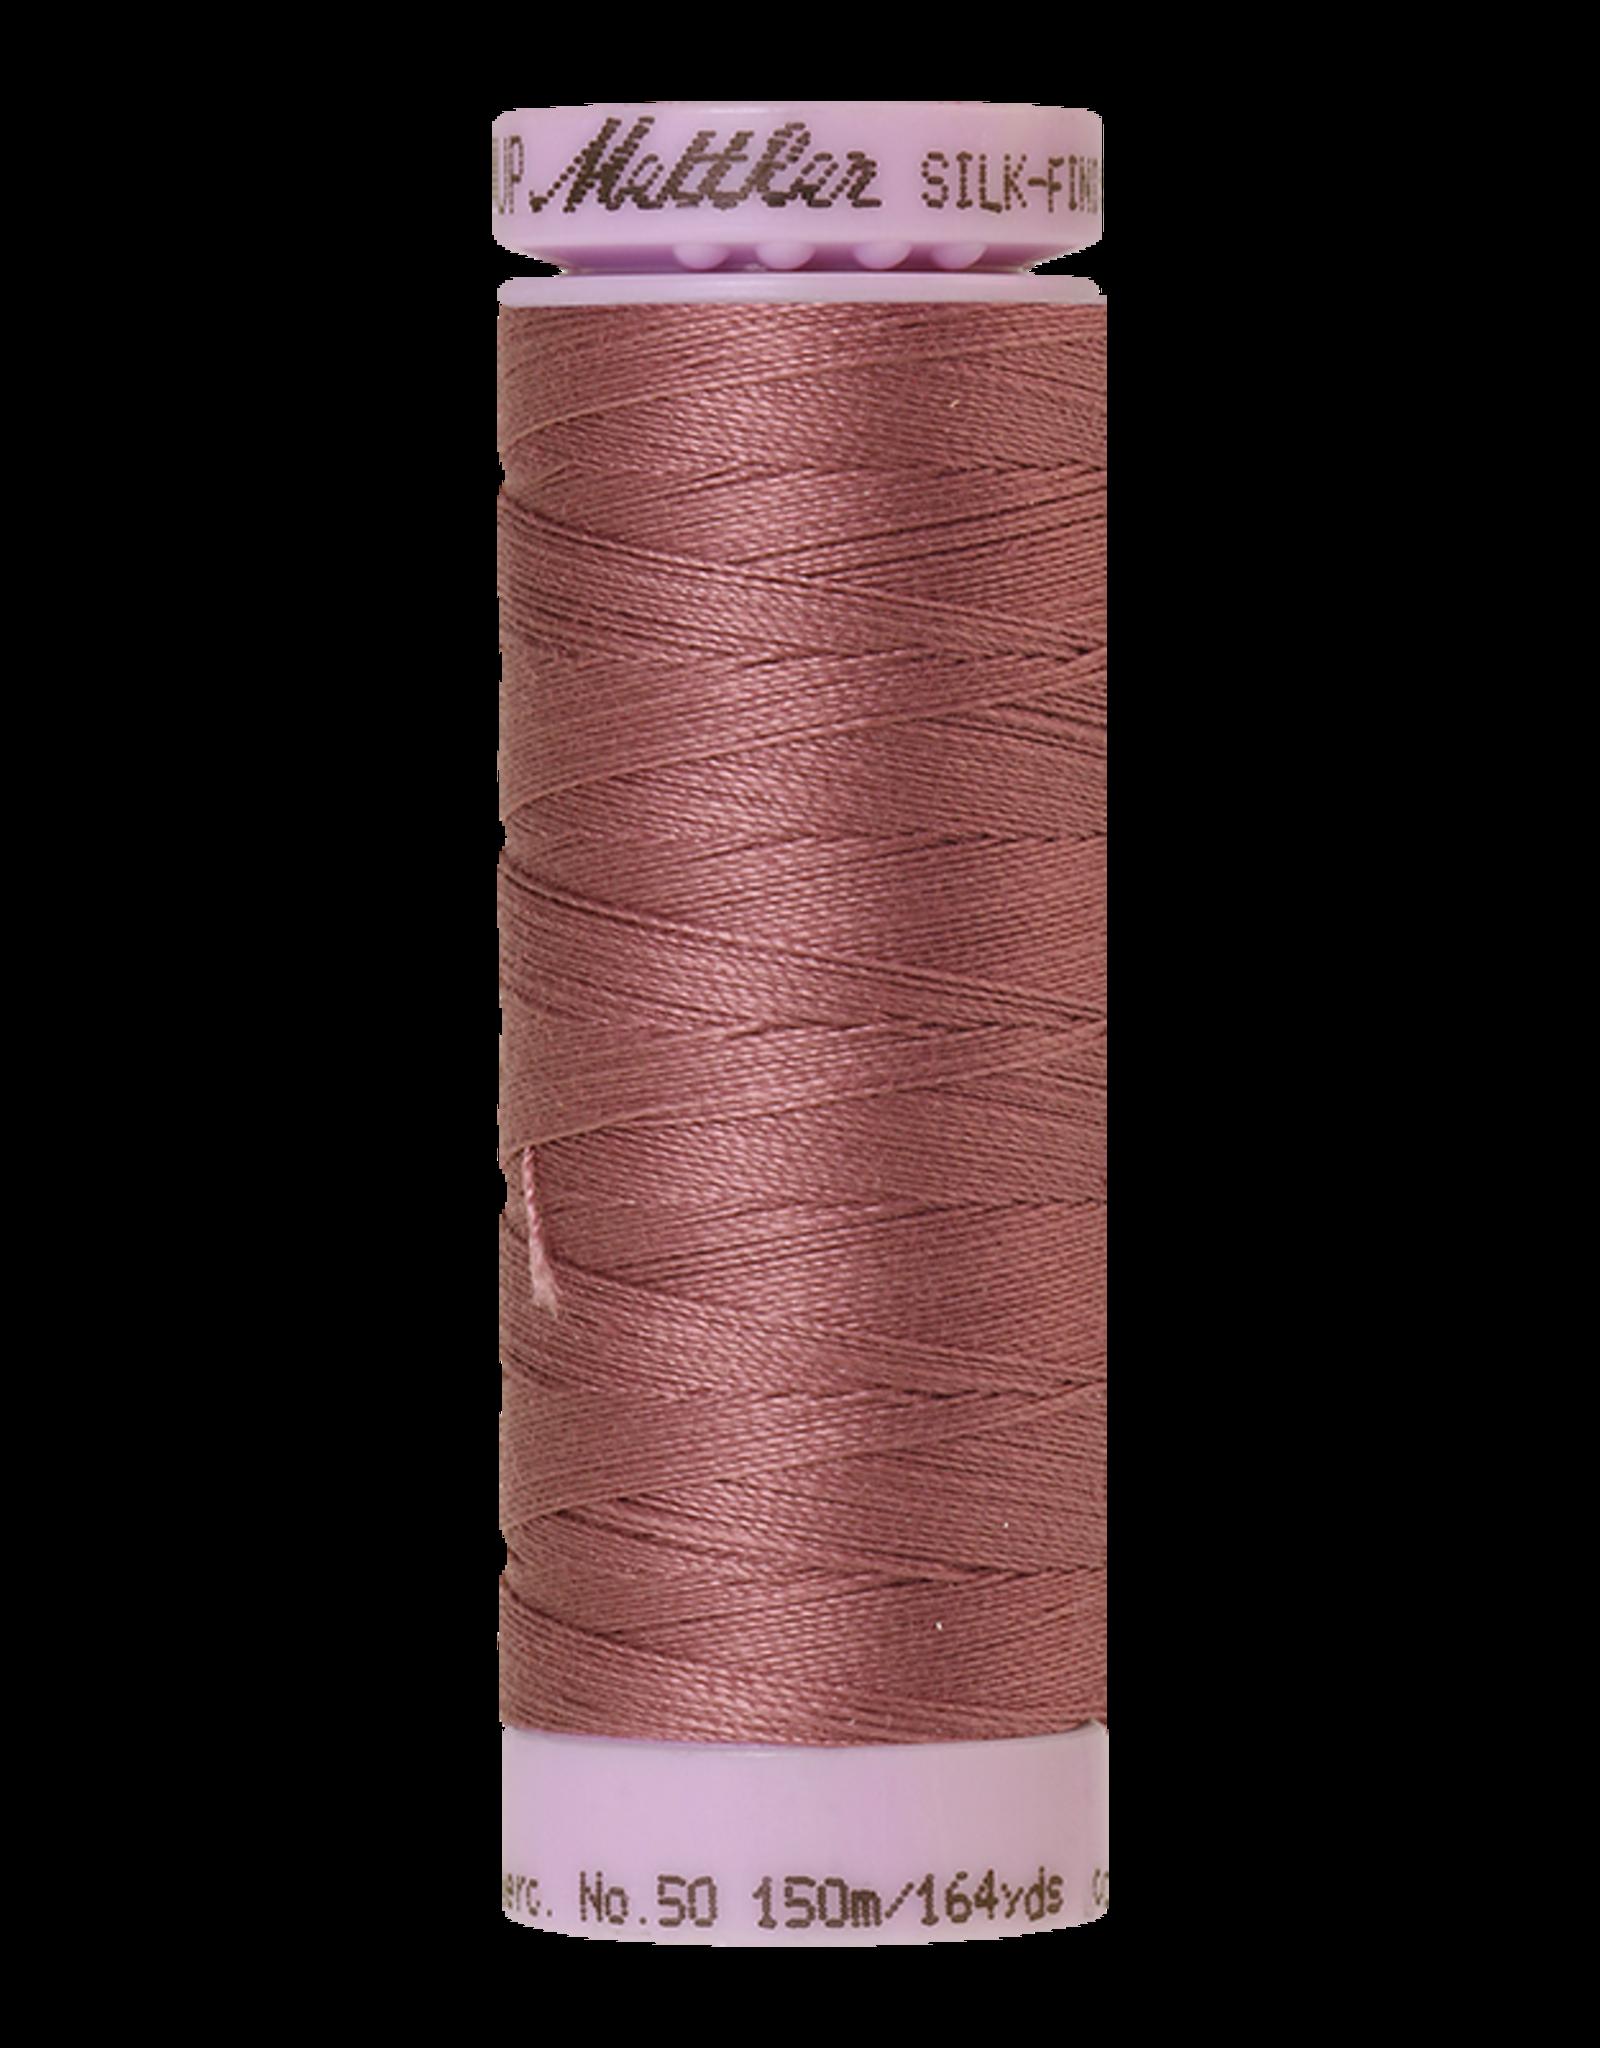 Mettler Silk Finish Cotton 50 - 150 meter - 0300